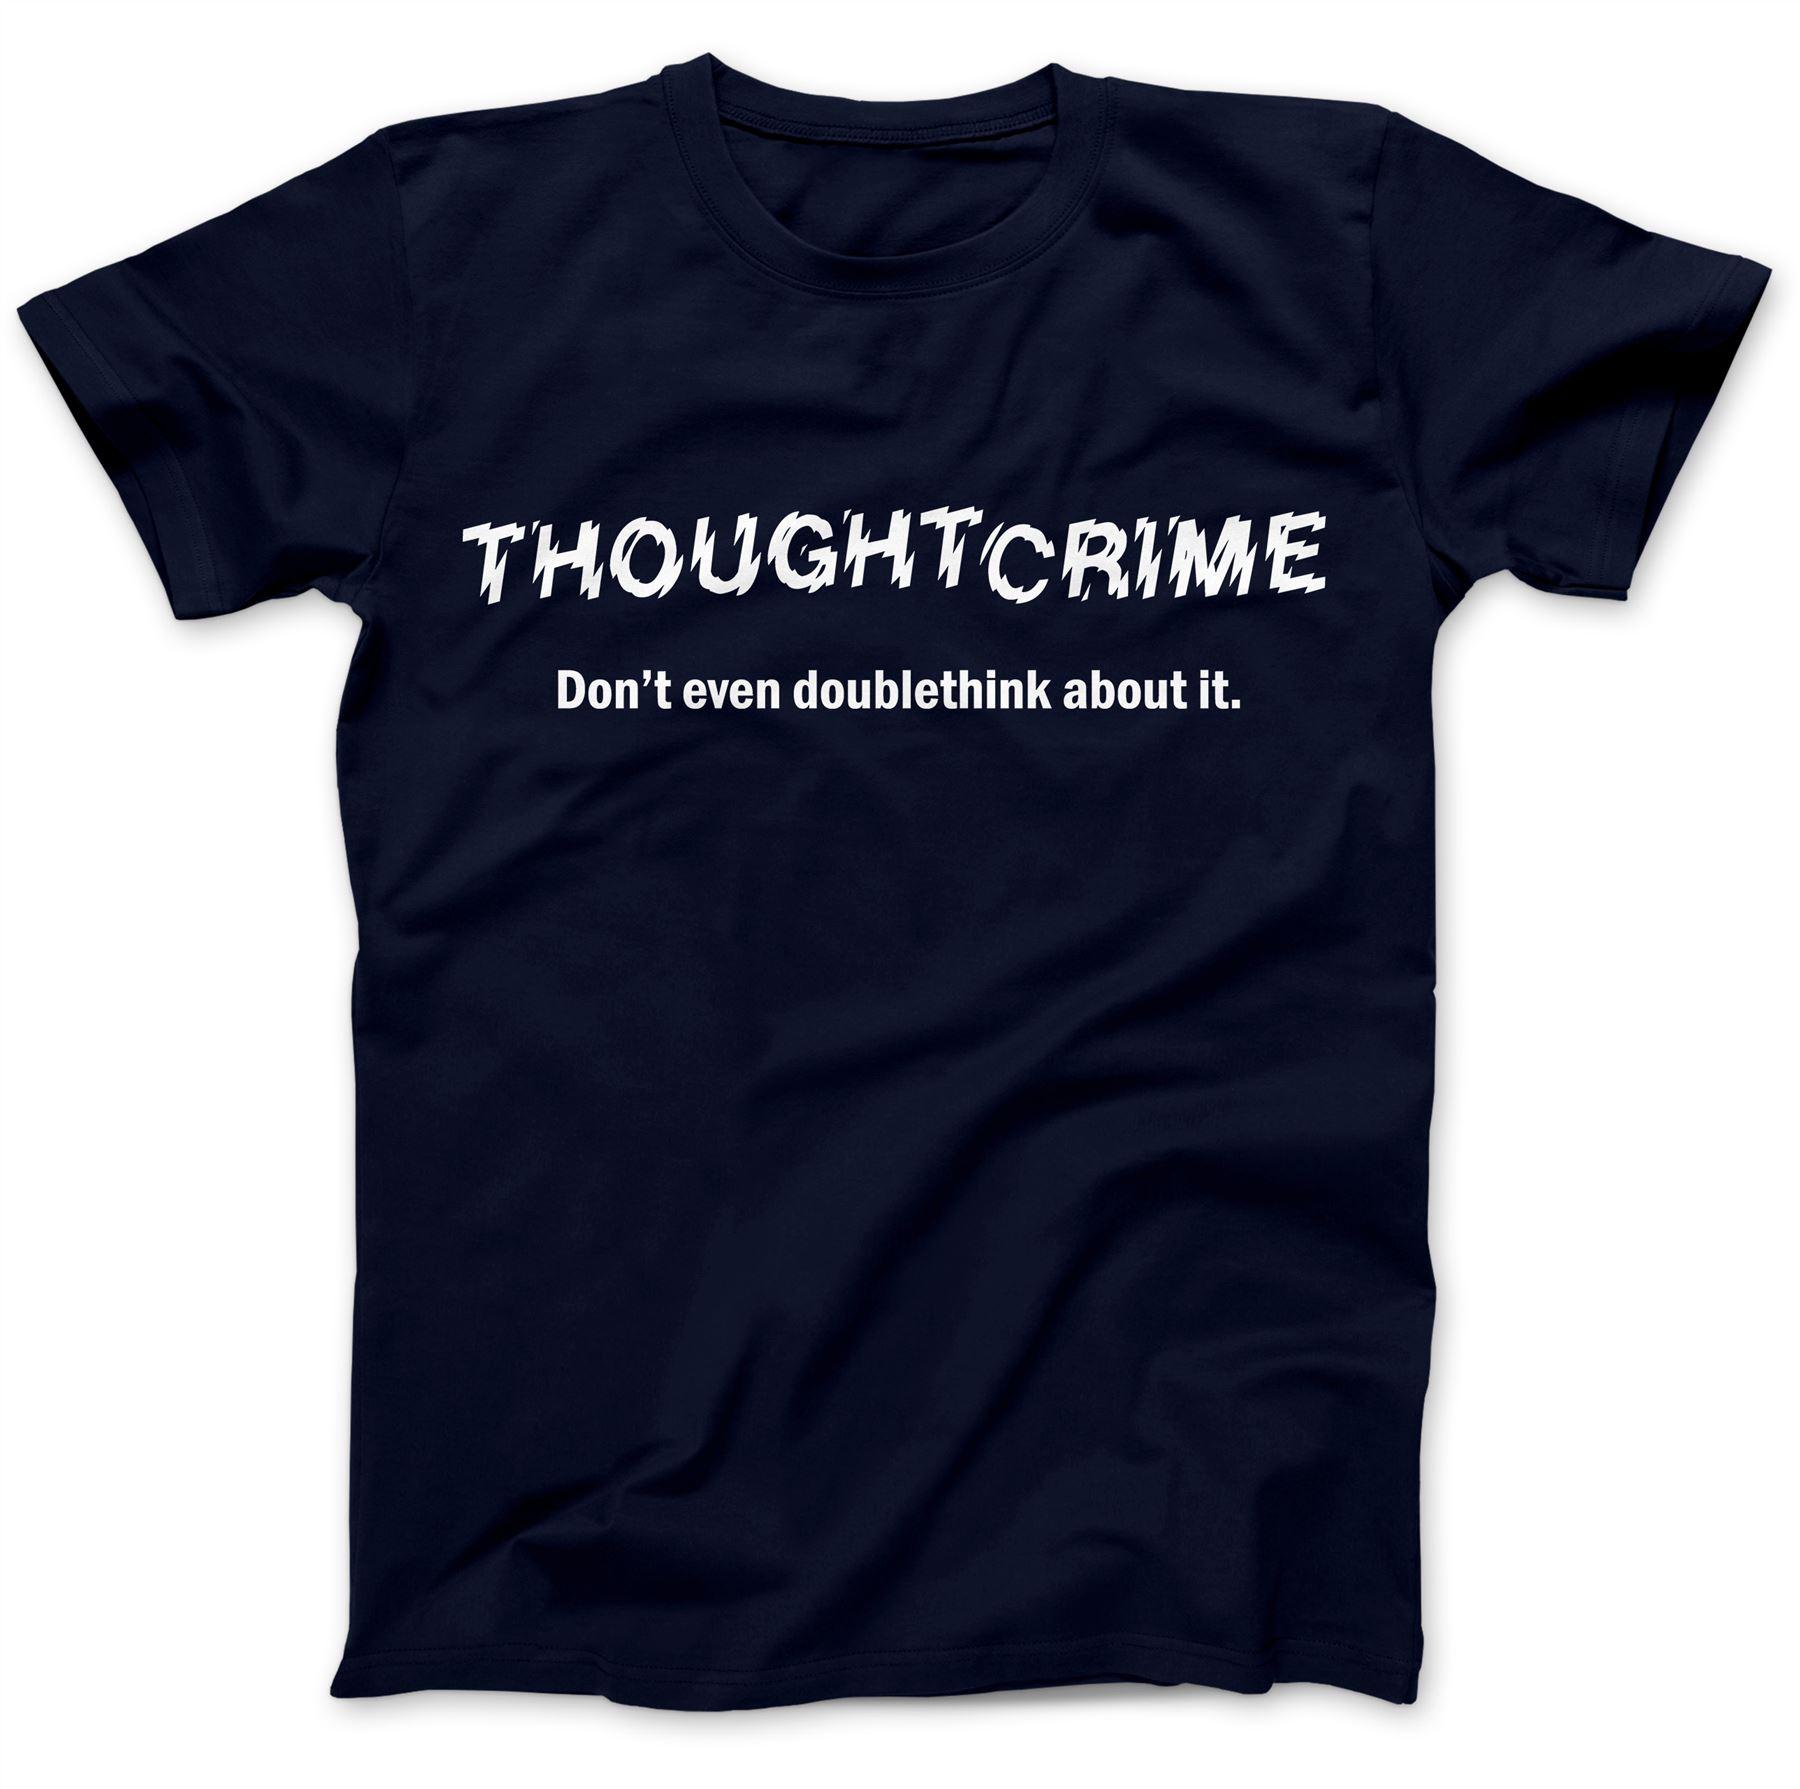 1984-Thought-Crime-George-Orwell-T-Shirt-100-Premium-Cotton-Animal-Farm miniatuur 15